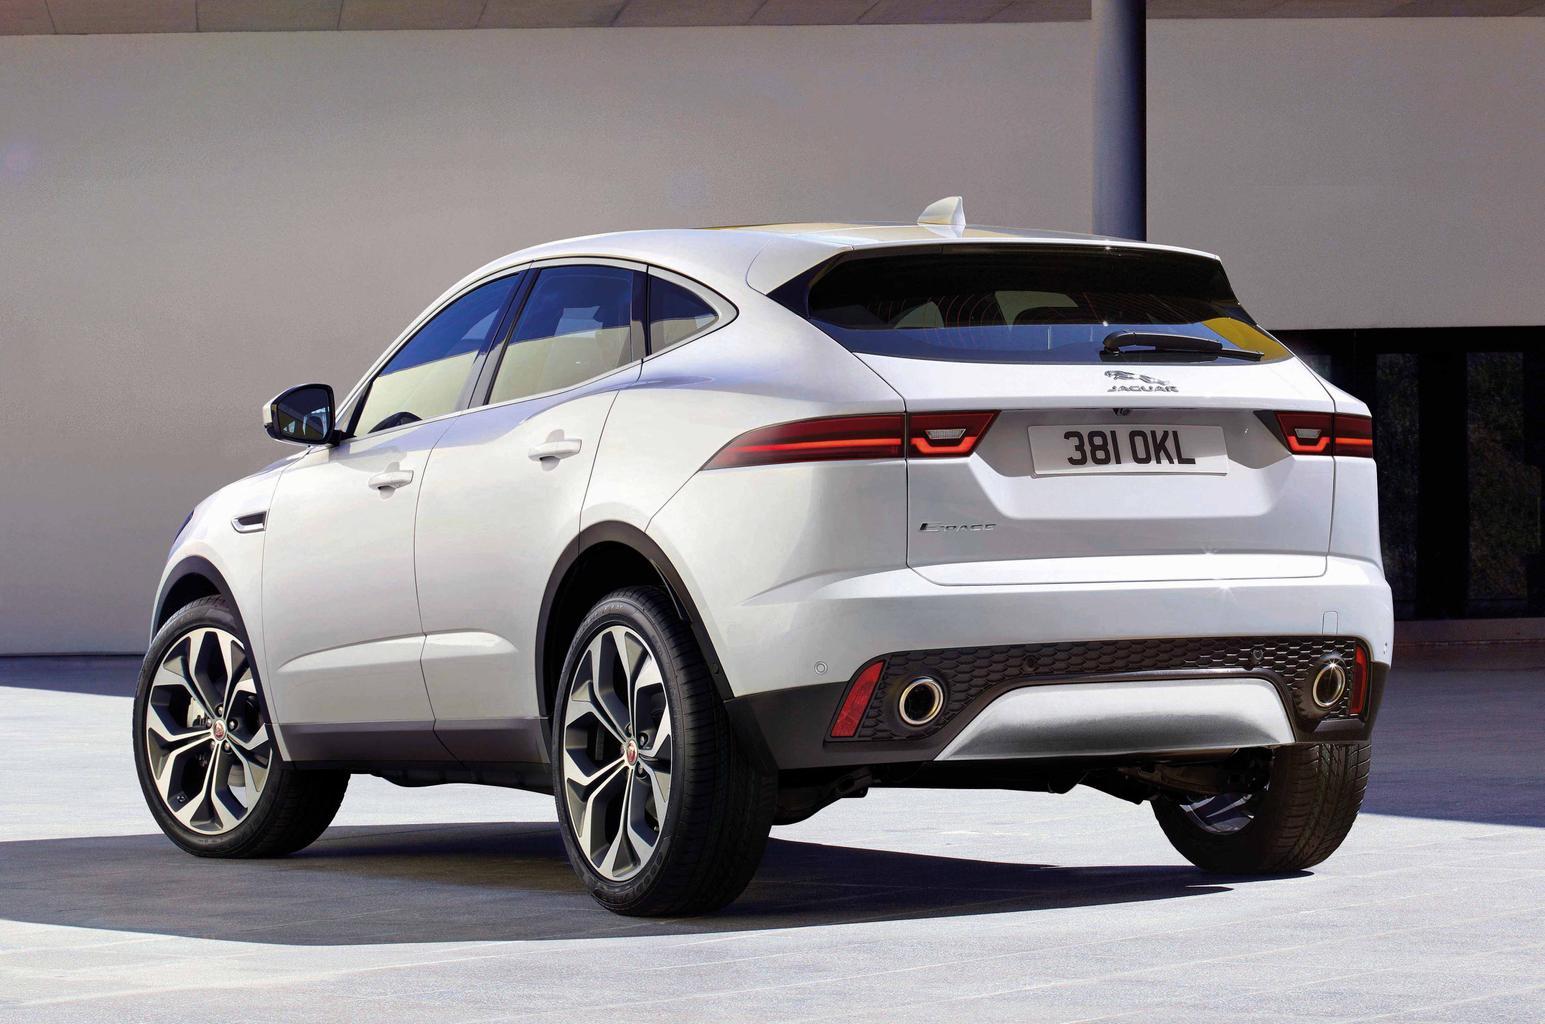 2018 Jaguar E-Pace SUV gallery